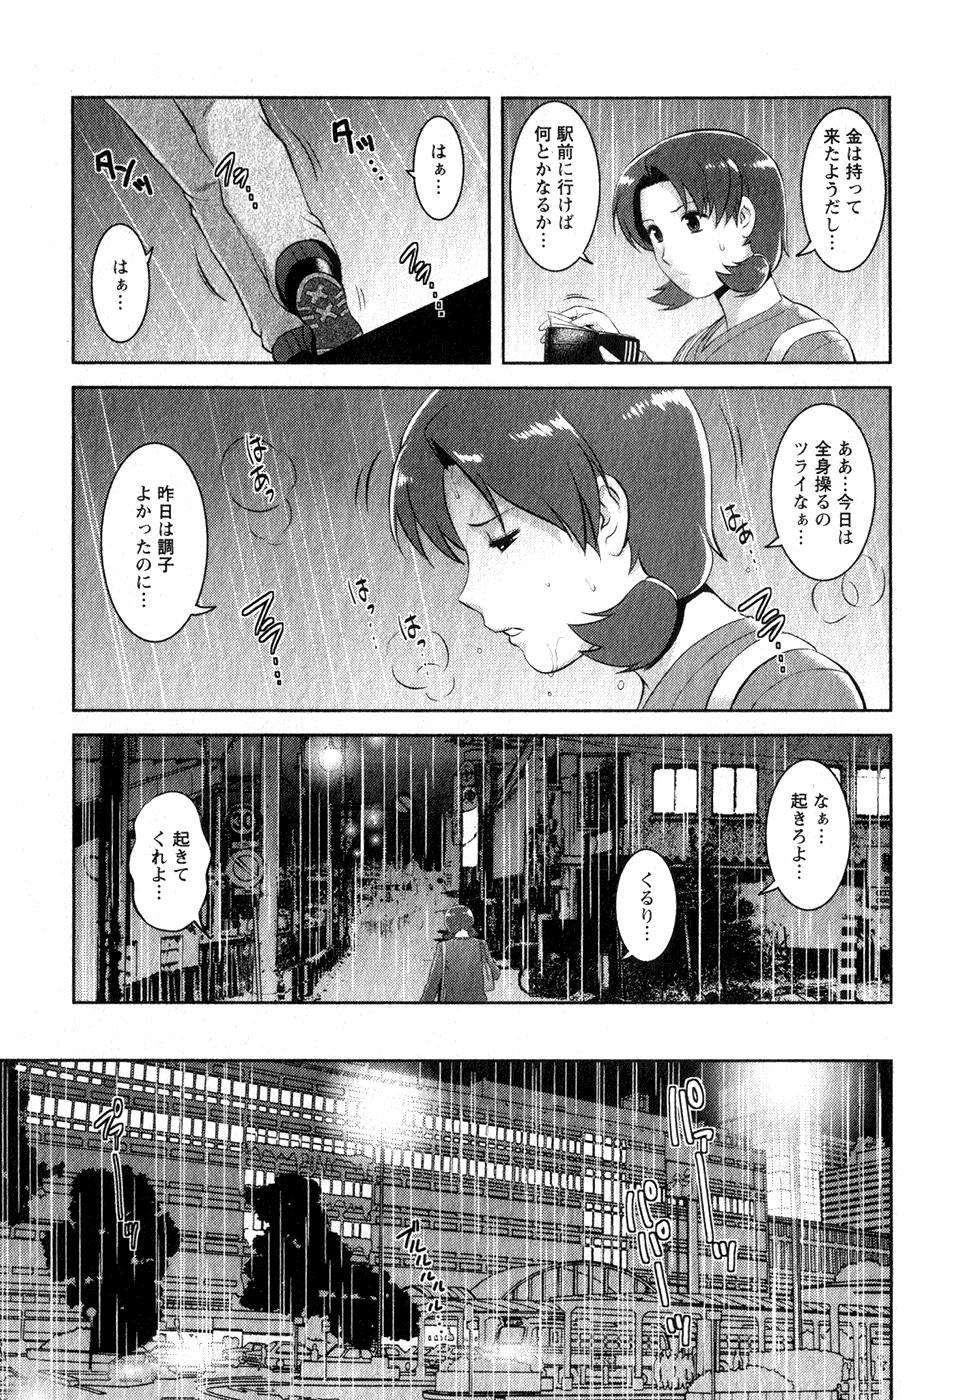 [Saigado] Kururi-san to Hirari-san Vol. 1 (Complete) 185